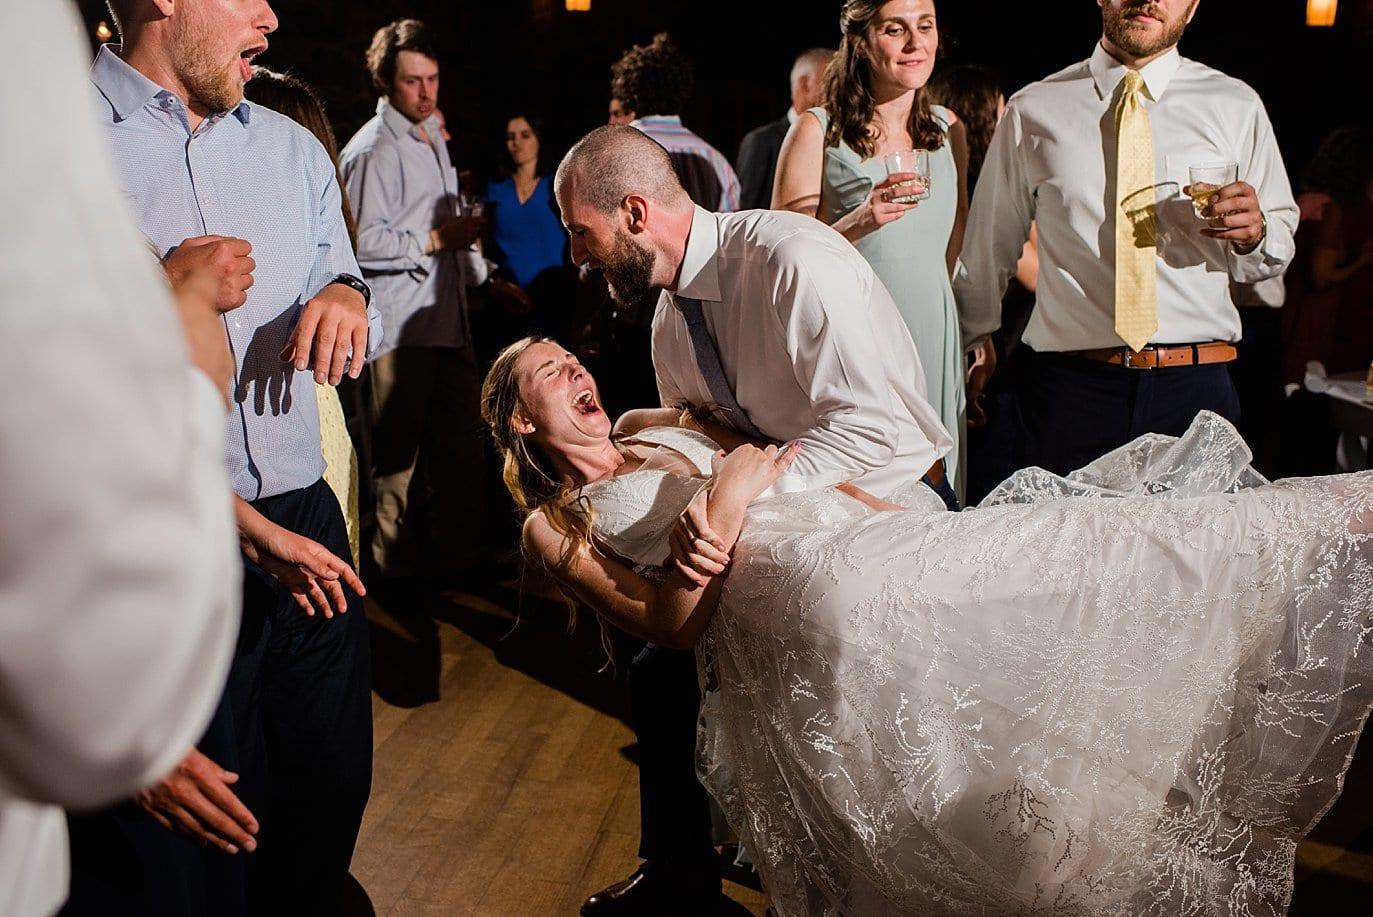 groom dips bride on dance floor at fall colorado wedding